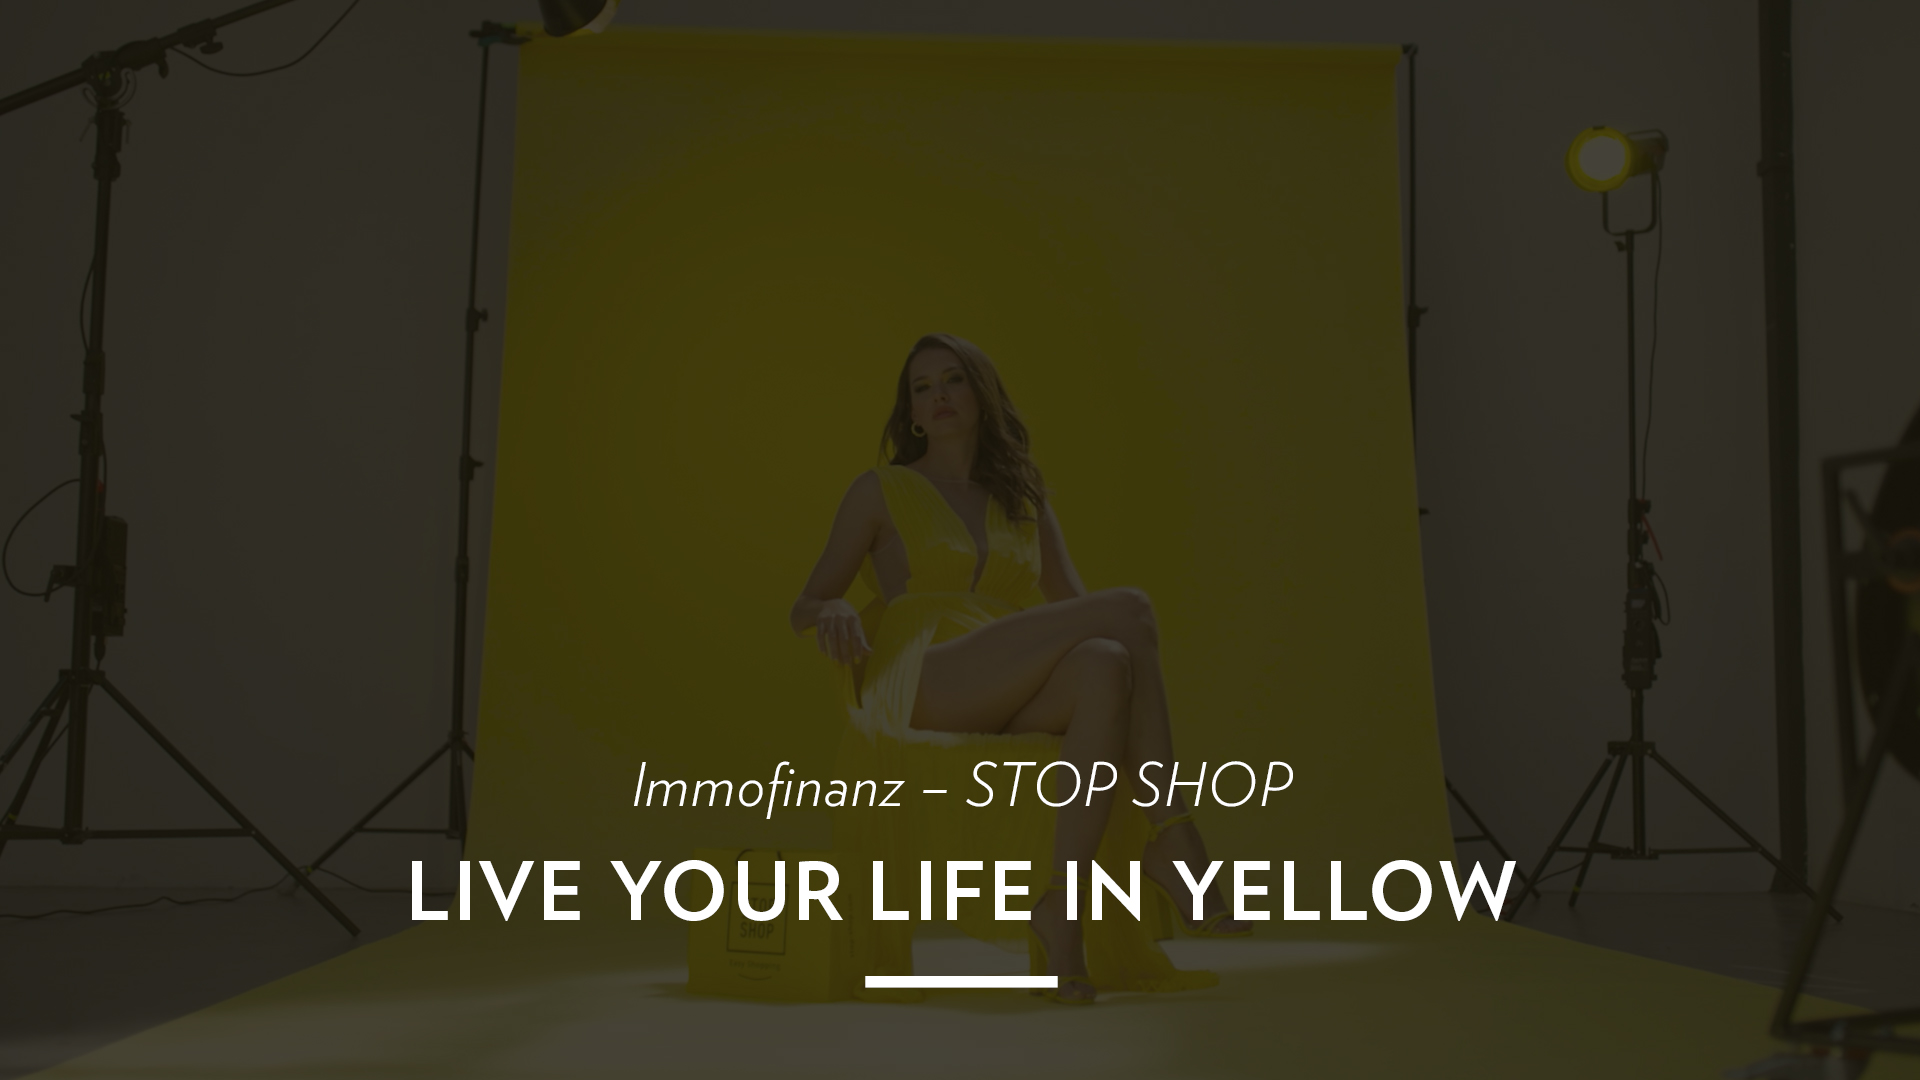 STOP SHOP LLY